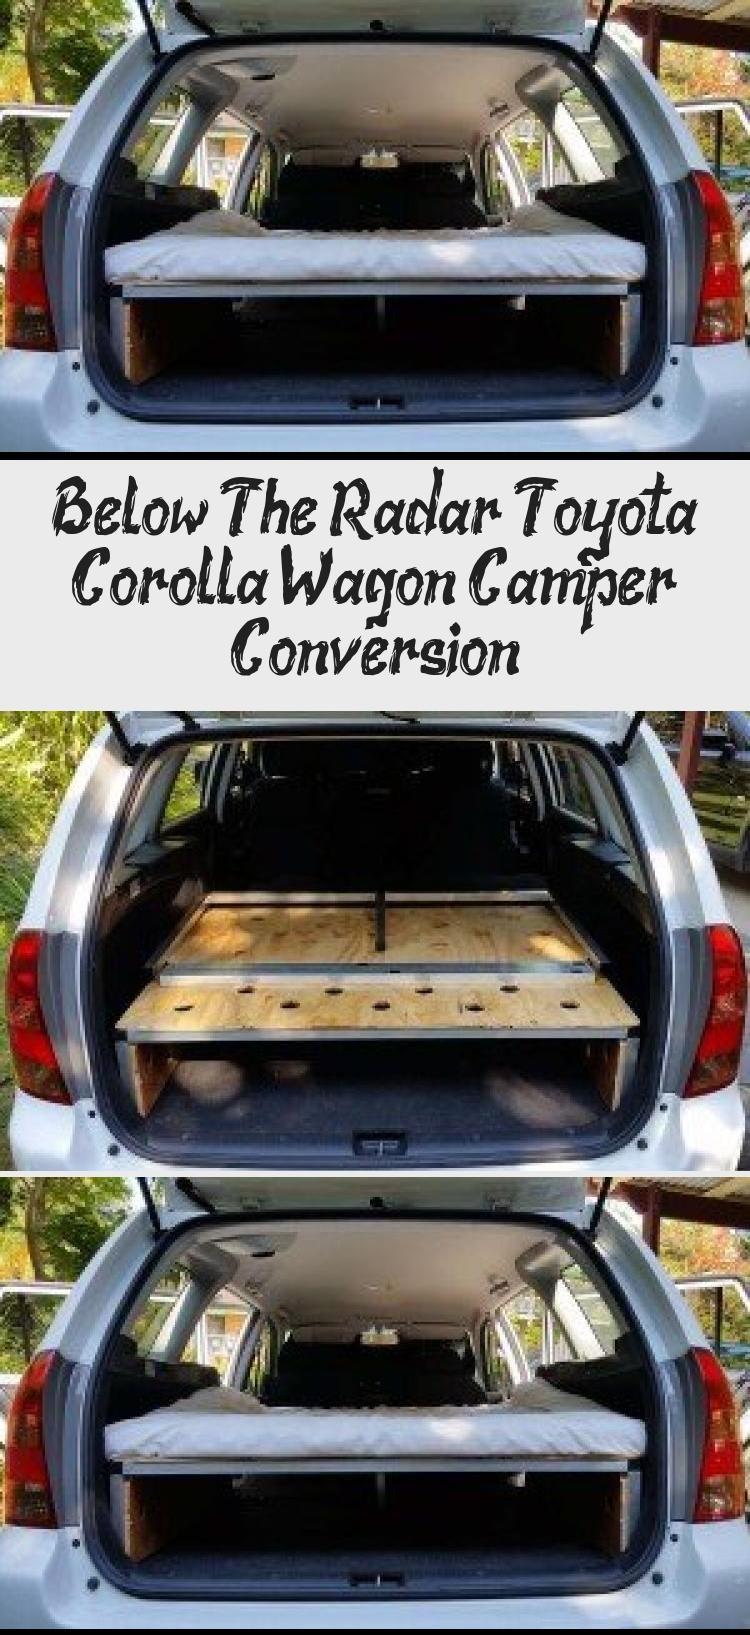 Below The Radar Toyota Corolla Wagon Camper Conversion Cars In 2020 Toyota Corolla Corolla Wagon Camper Conversion